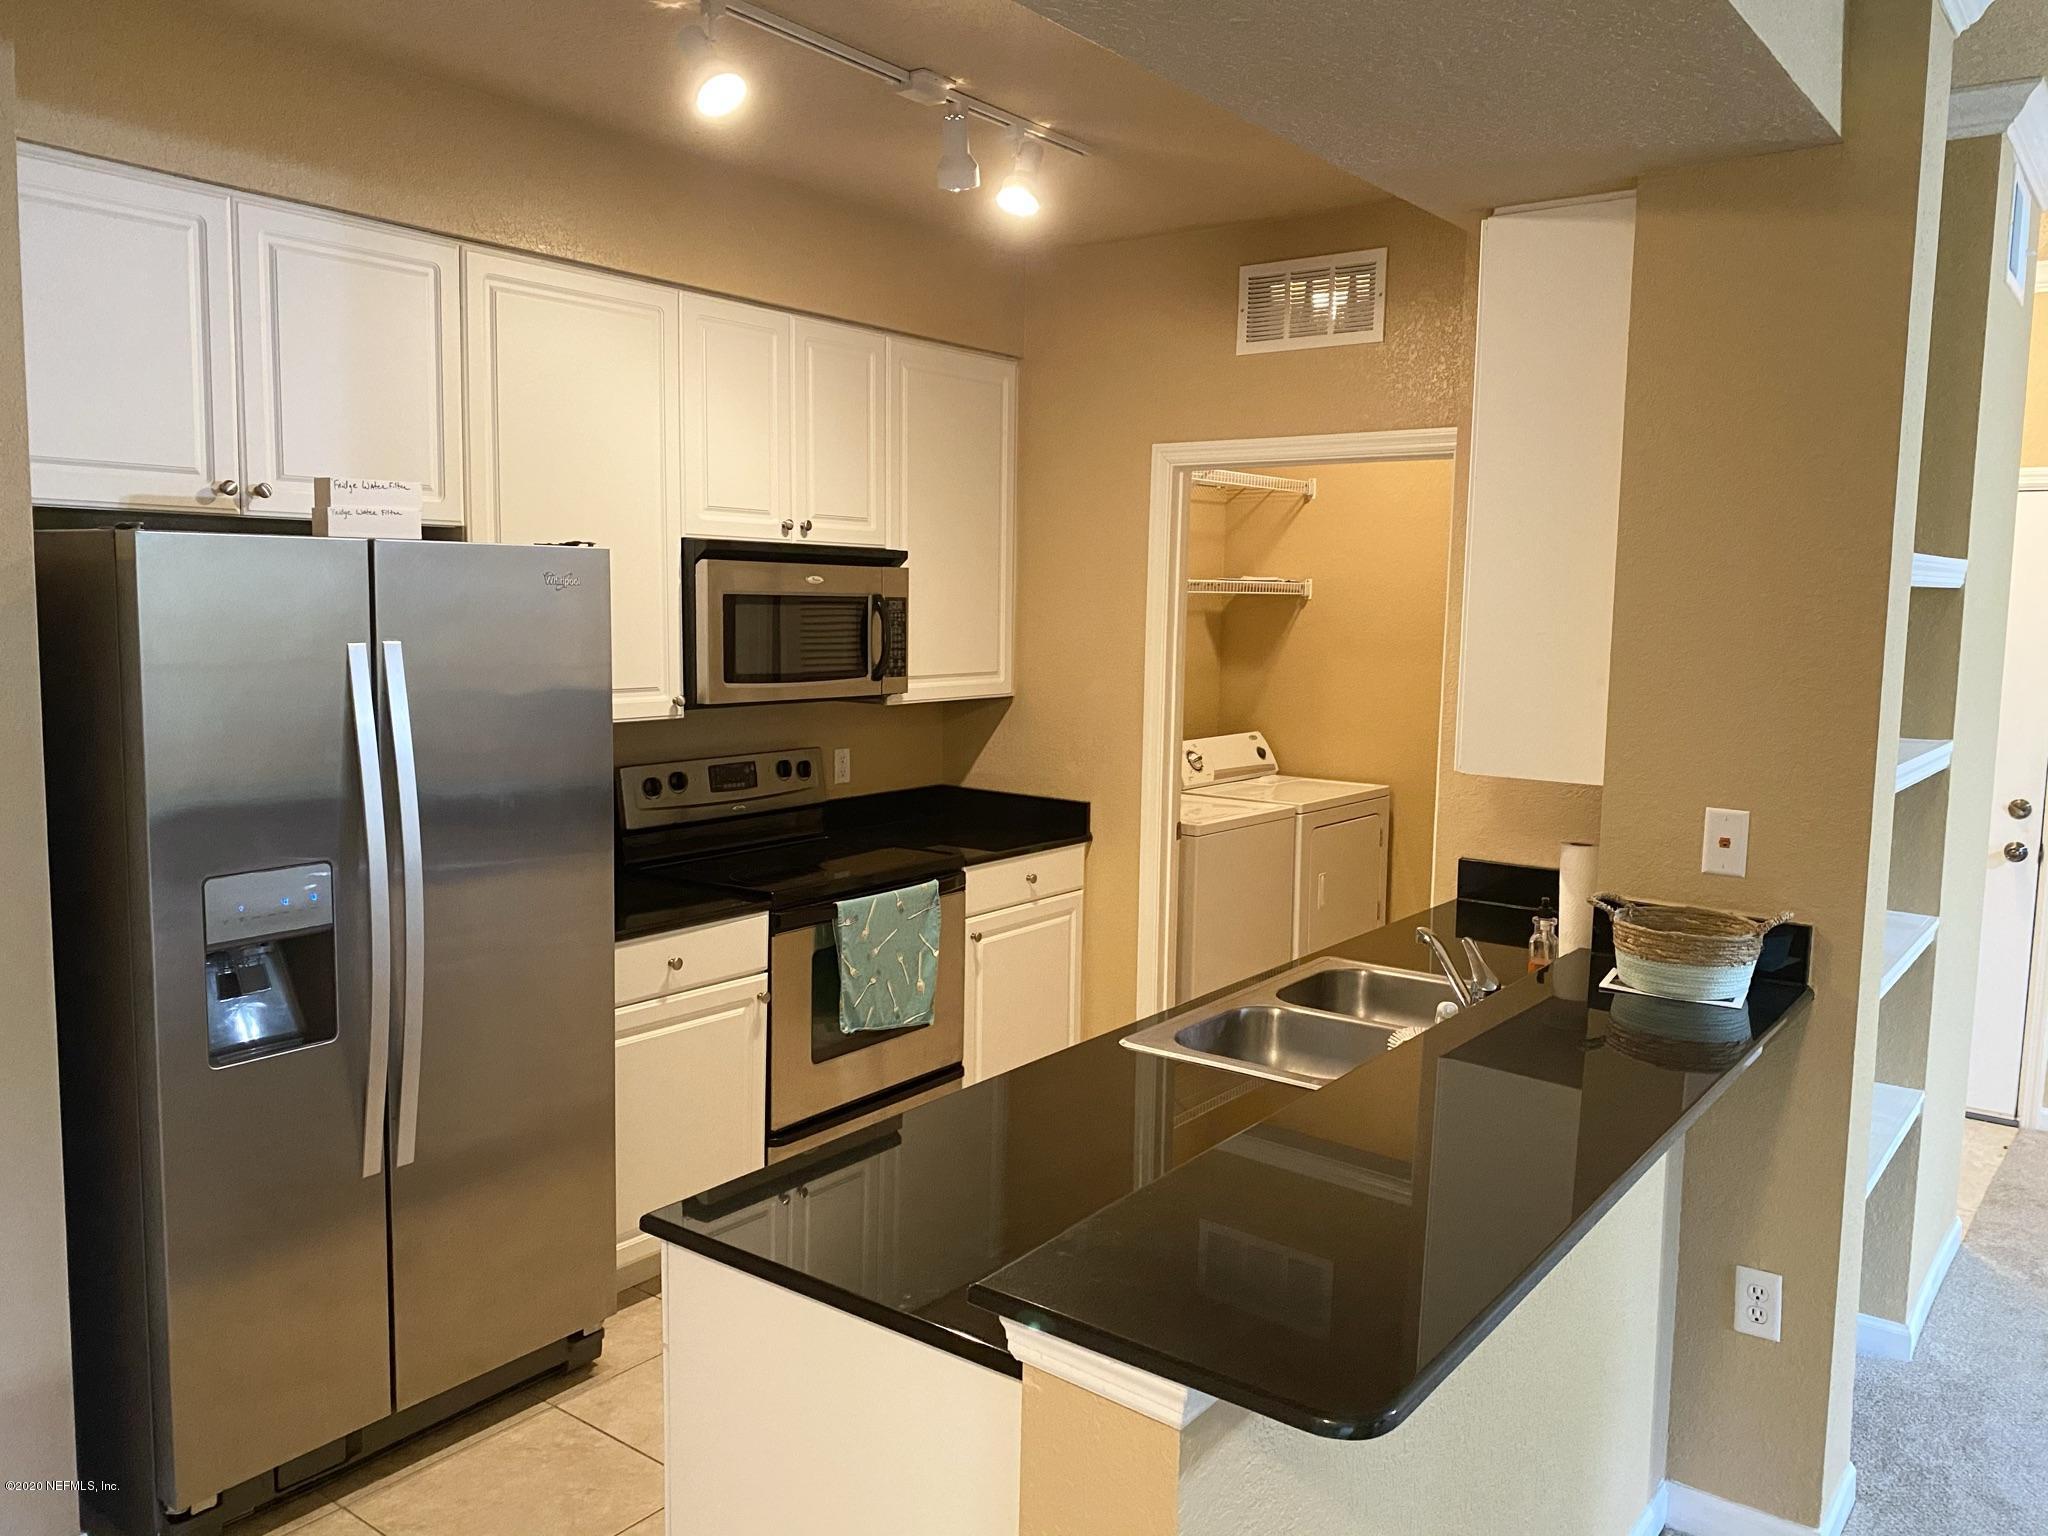 8539 GATE, JACKSONVILLE, FLORIDA 32216, 2 Bedrooms Bedrooms, ,2 BathroomsBathrooms,Rental,For Rent,GATE,1082507